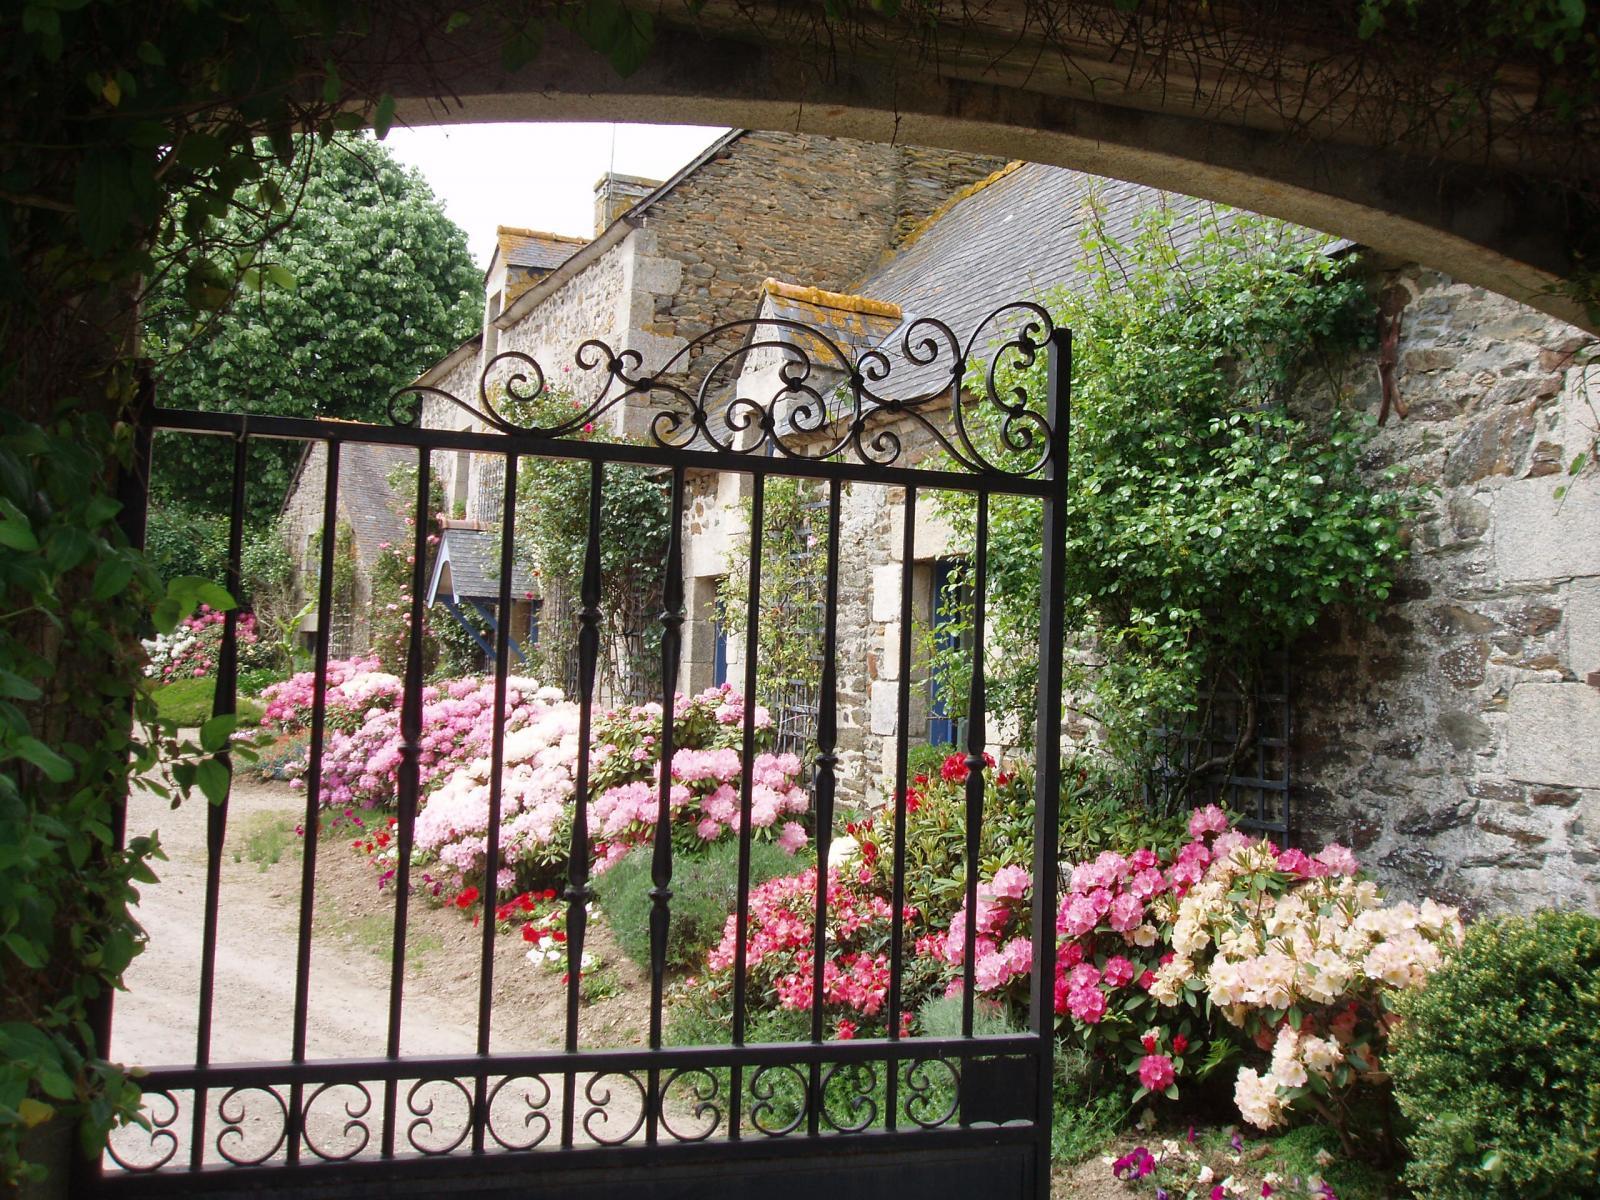 Tourisme rural Bretagne – Tourisme vert et gites en Bretagne